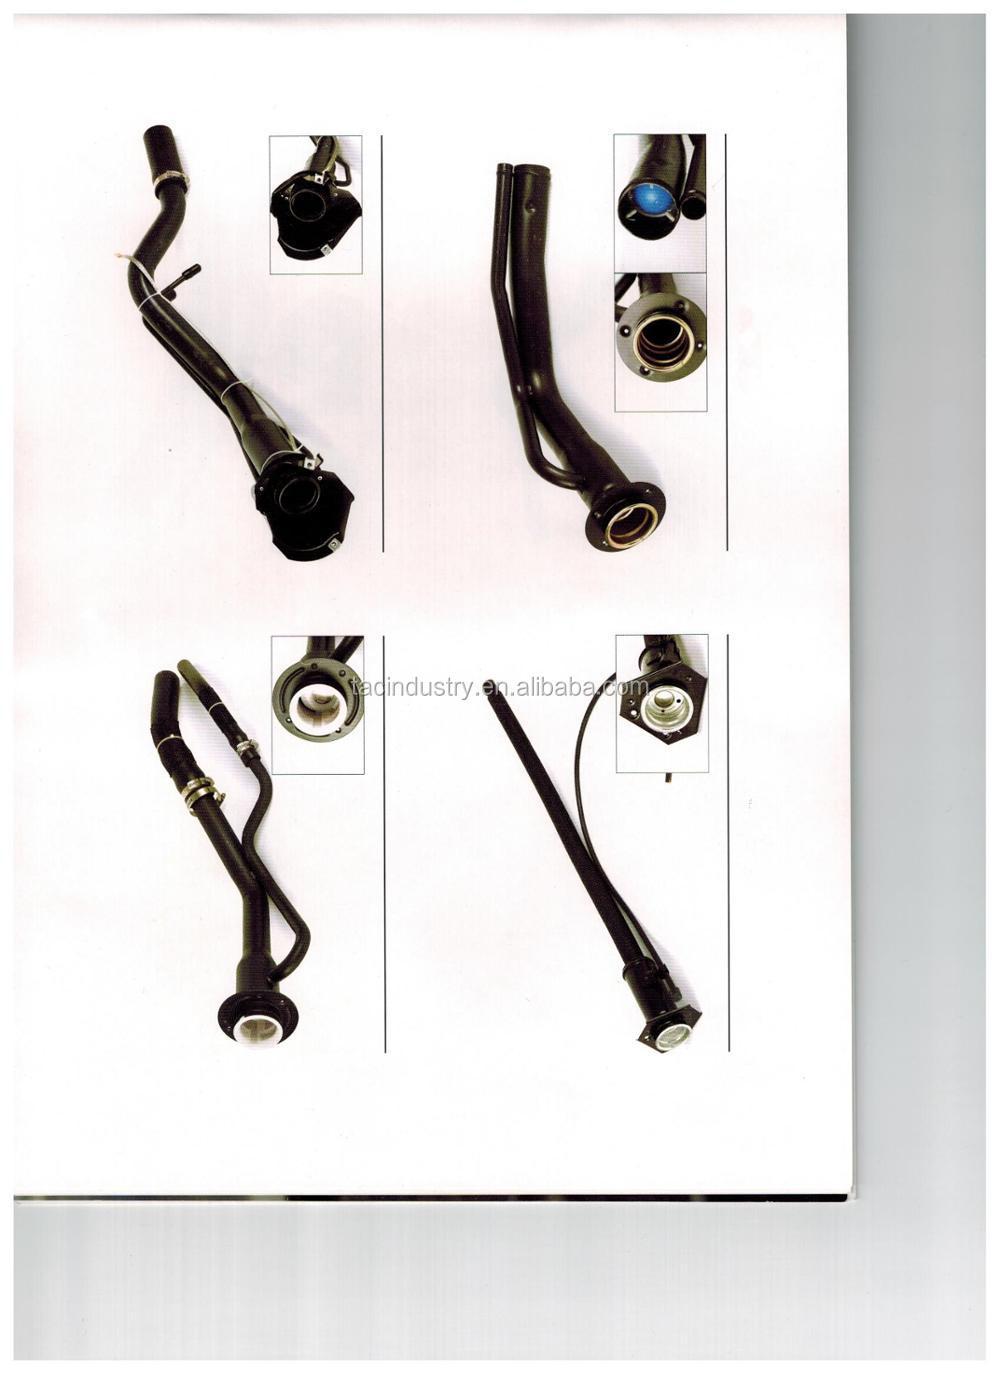 1999 - 2005 Vitz T Sport Mk1 Petrol Fuel Tank Filler Neck Pipe - Buy Fuel  Tank Filler Neck Hose Pipe,Fuel Filler Neck,Gas Filler Neck Pipe Product on